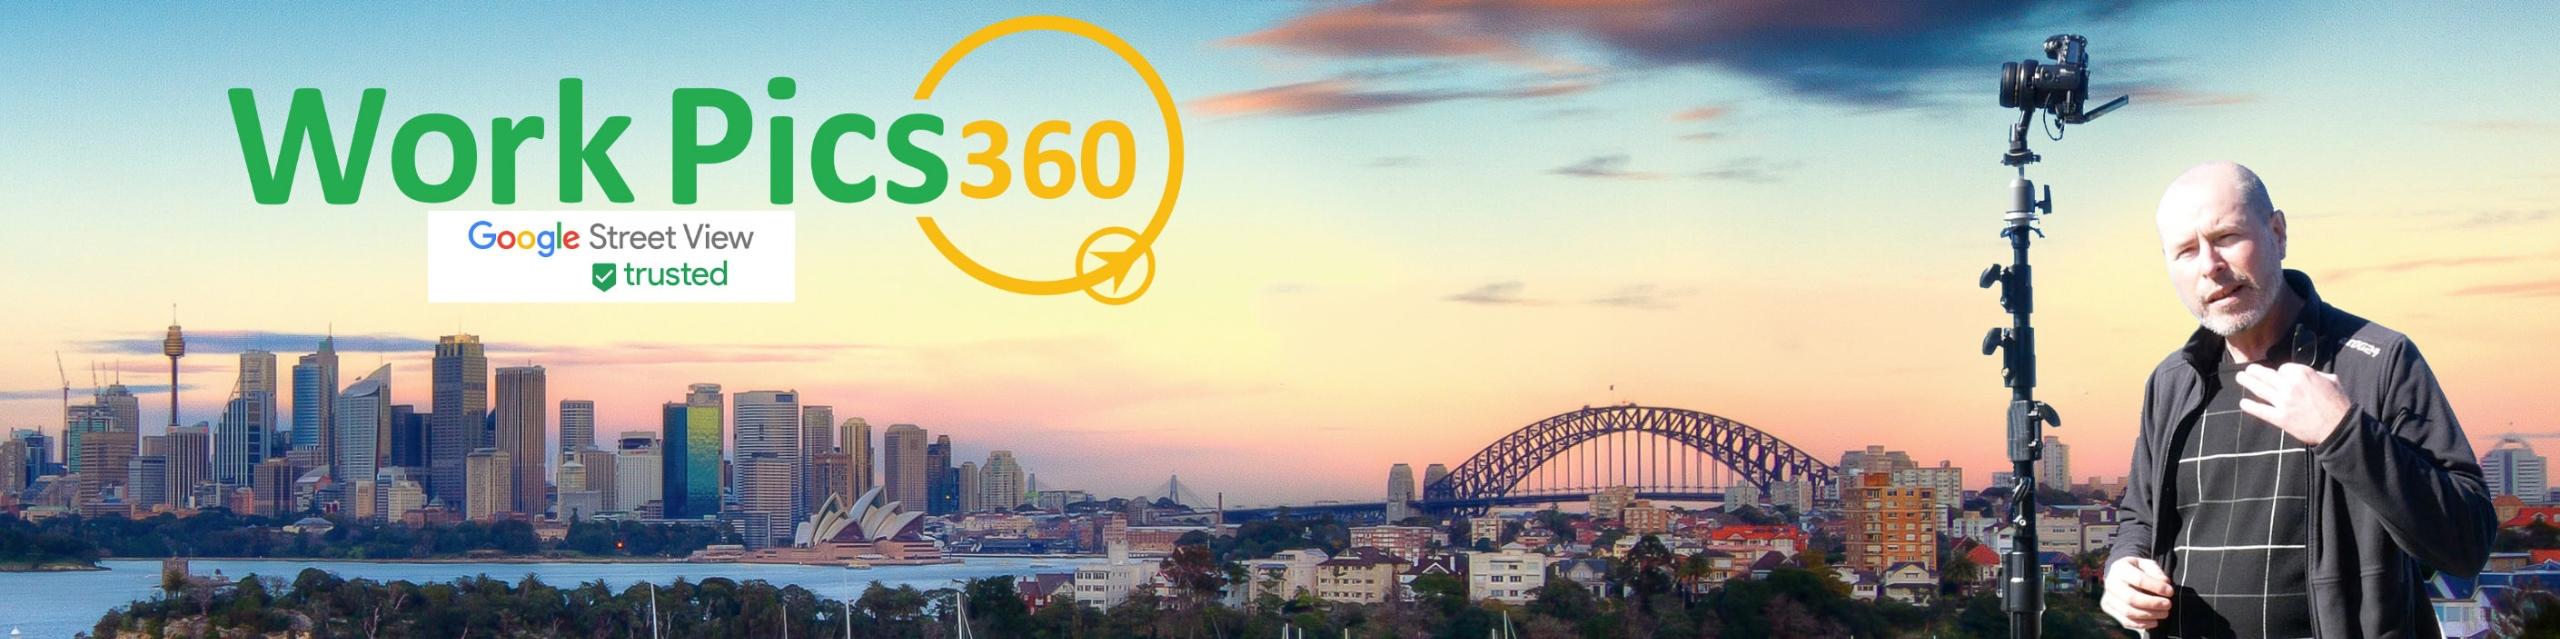 Work Pics 360 (@workpics360) Cover Image